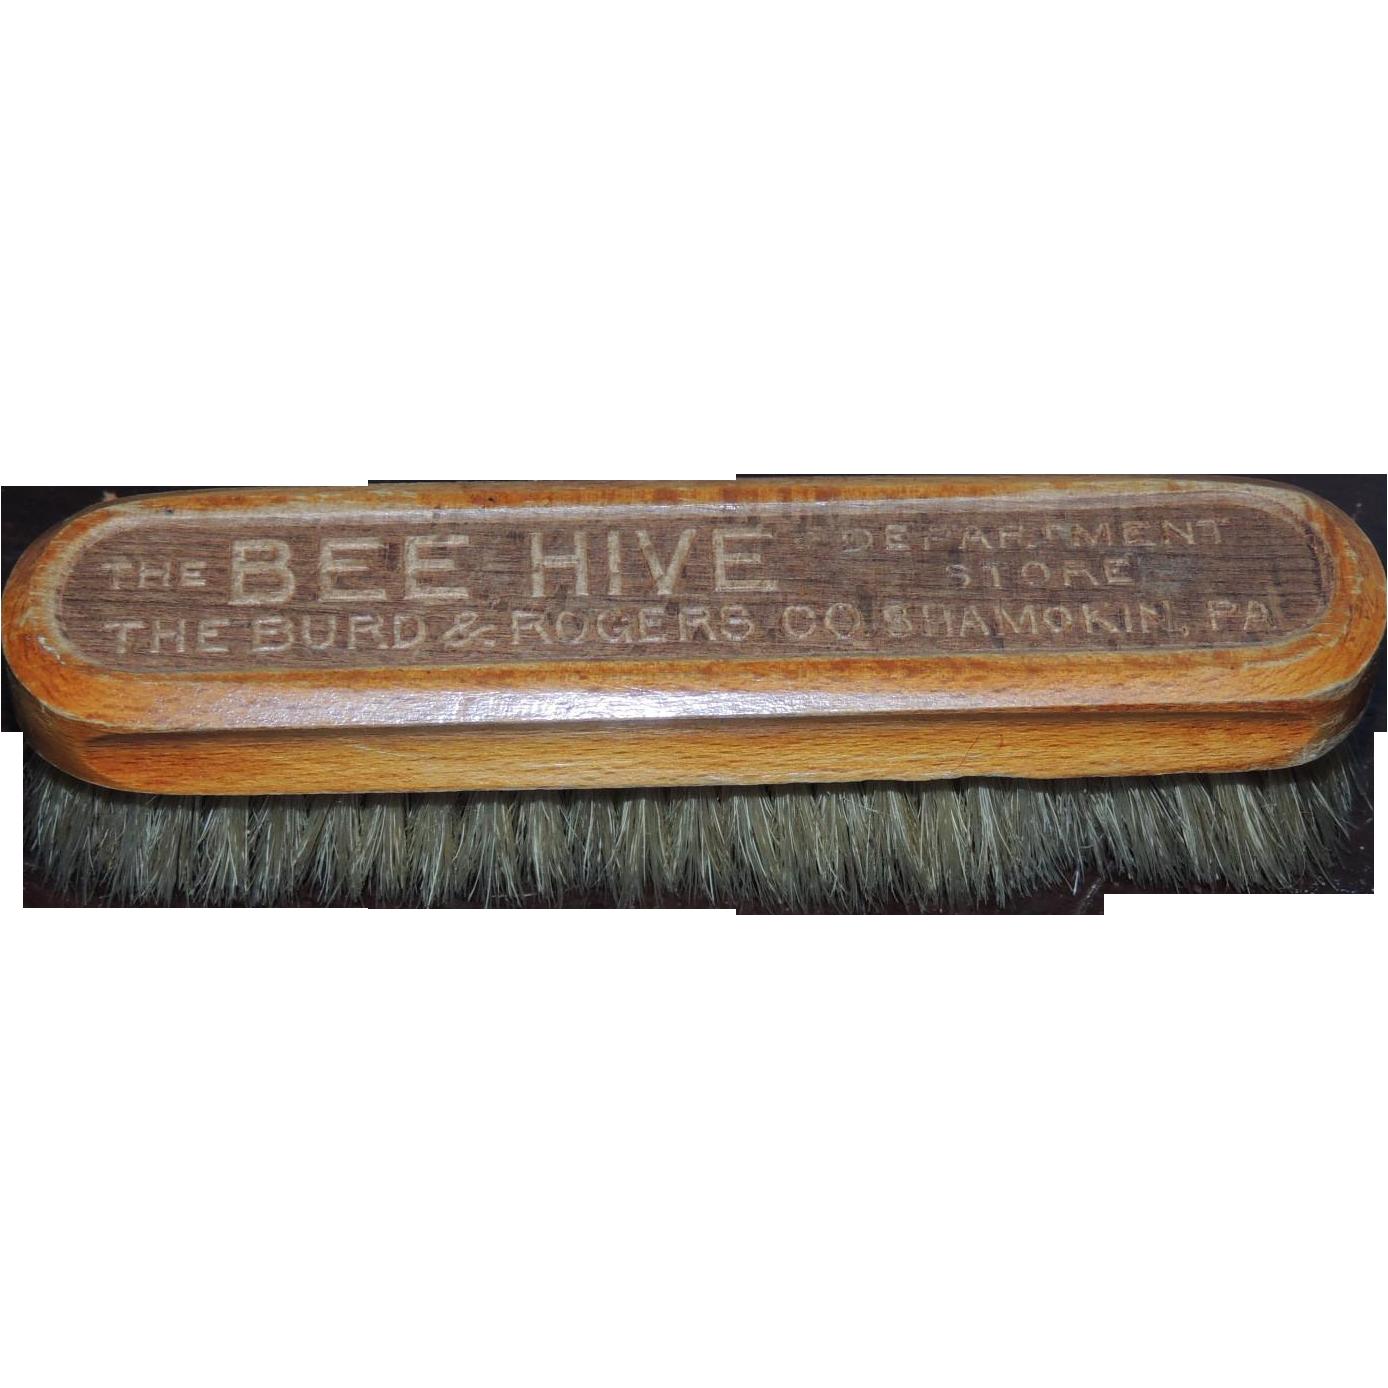 Burd Rogers Bee Hive Store Dresser Brush Shamokin Pa From